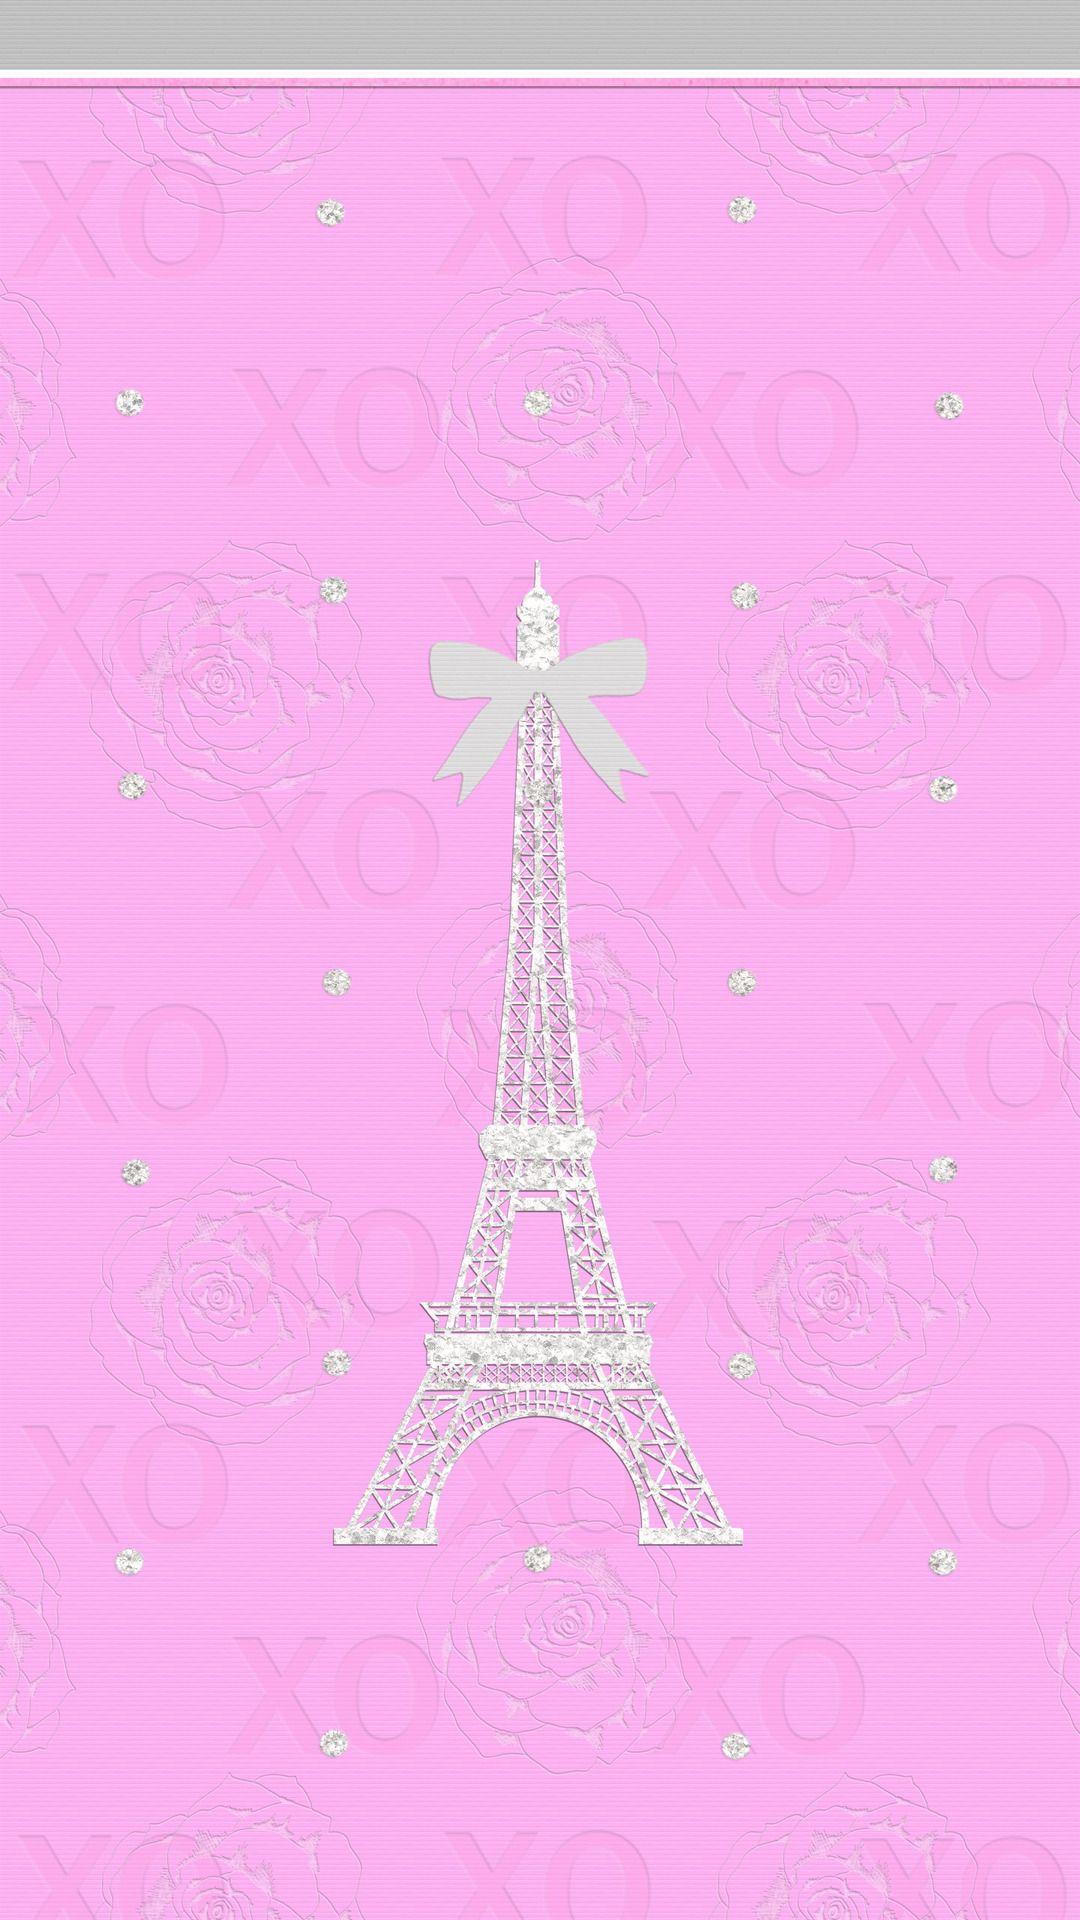 Wallpapers Cute Pink Wallpapers Pretty Wallpapers Winter Wonderland Wallpaper Bow Wallpaper